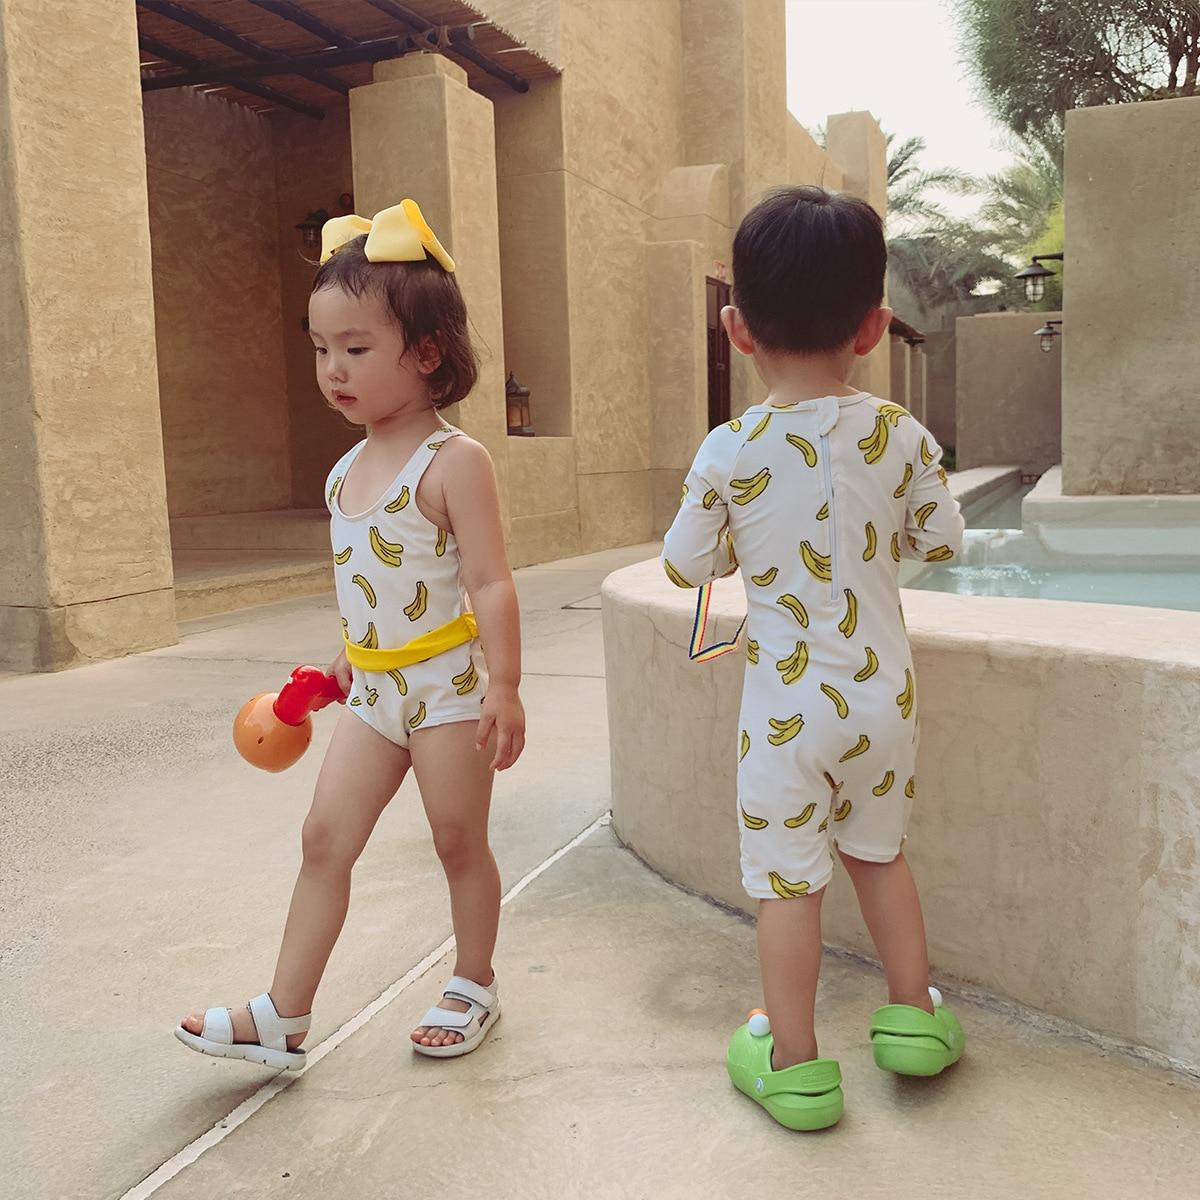 Kids Swimwear Sets New Summer Brand Design Girls Boys Cute Banana Print Swimsuits Baby Toddler Beach Holiday Bikini Clothing